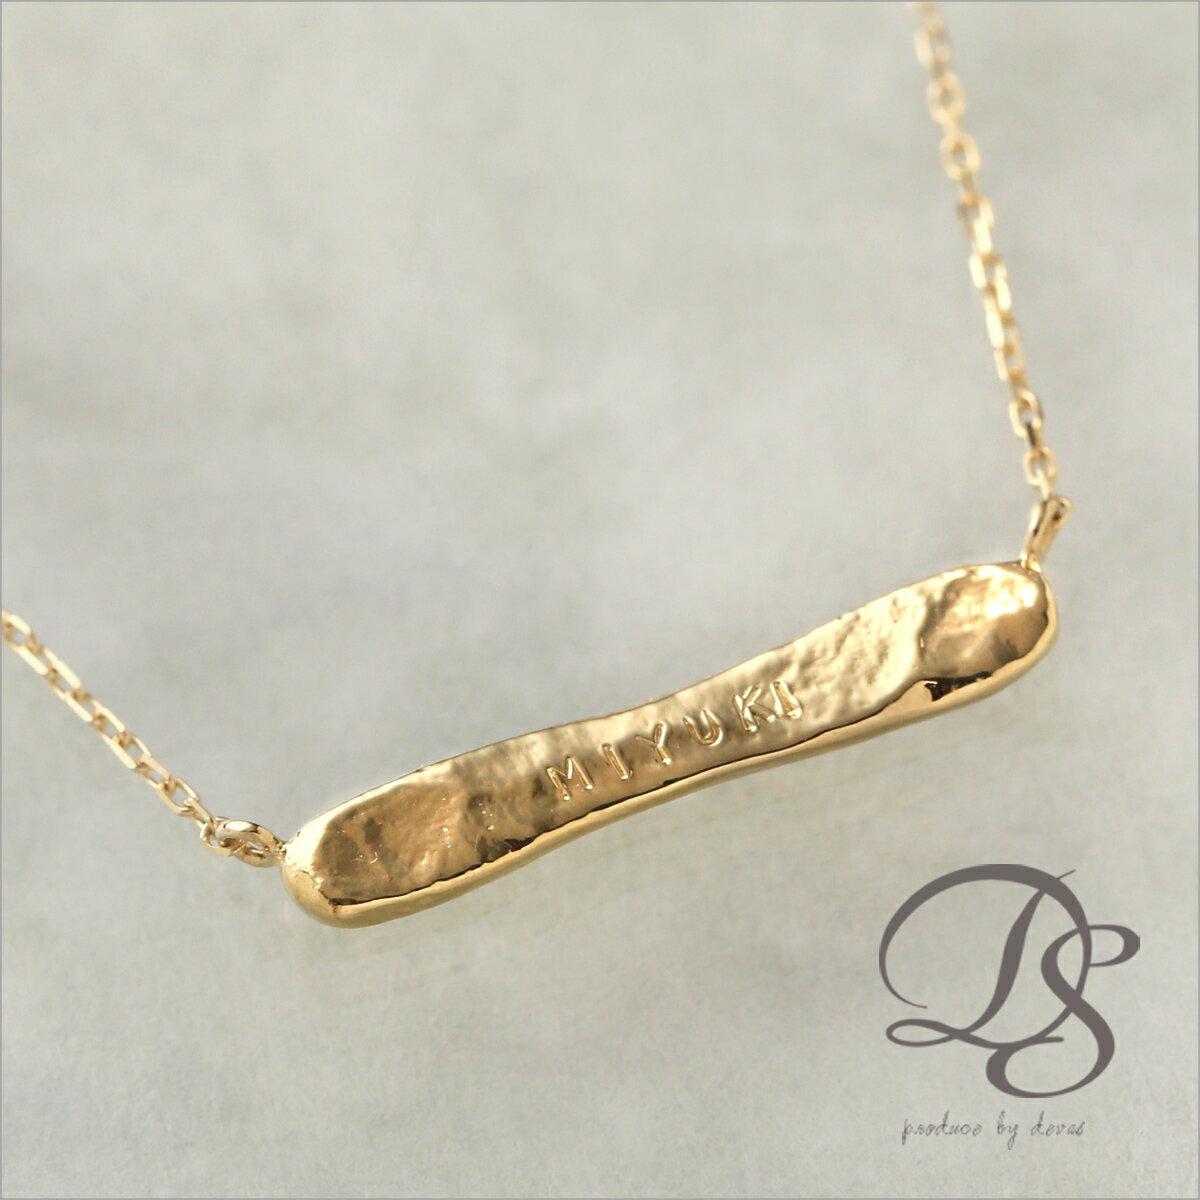 K18 ゴールド ネックレス ネーム刻印 レディース プレゼント DEVAS ディーヴァス k18 ネックレス ネーム オリジナル ネックレス 18k ネックレス 18金 ネックレス